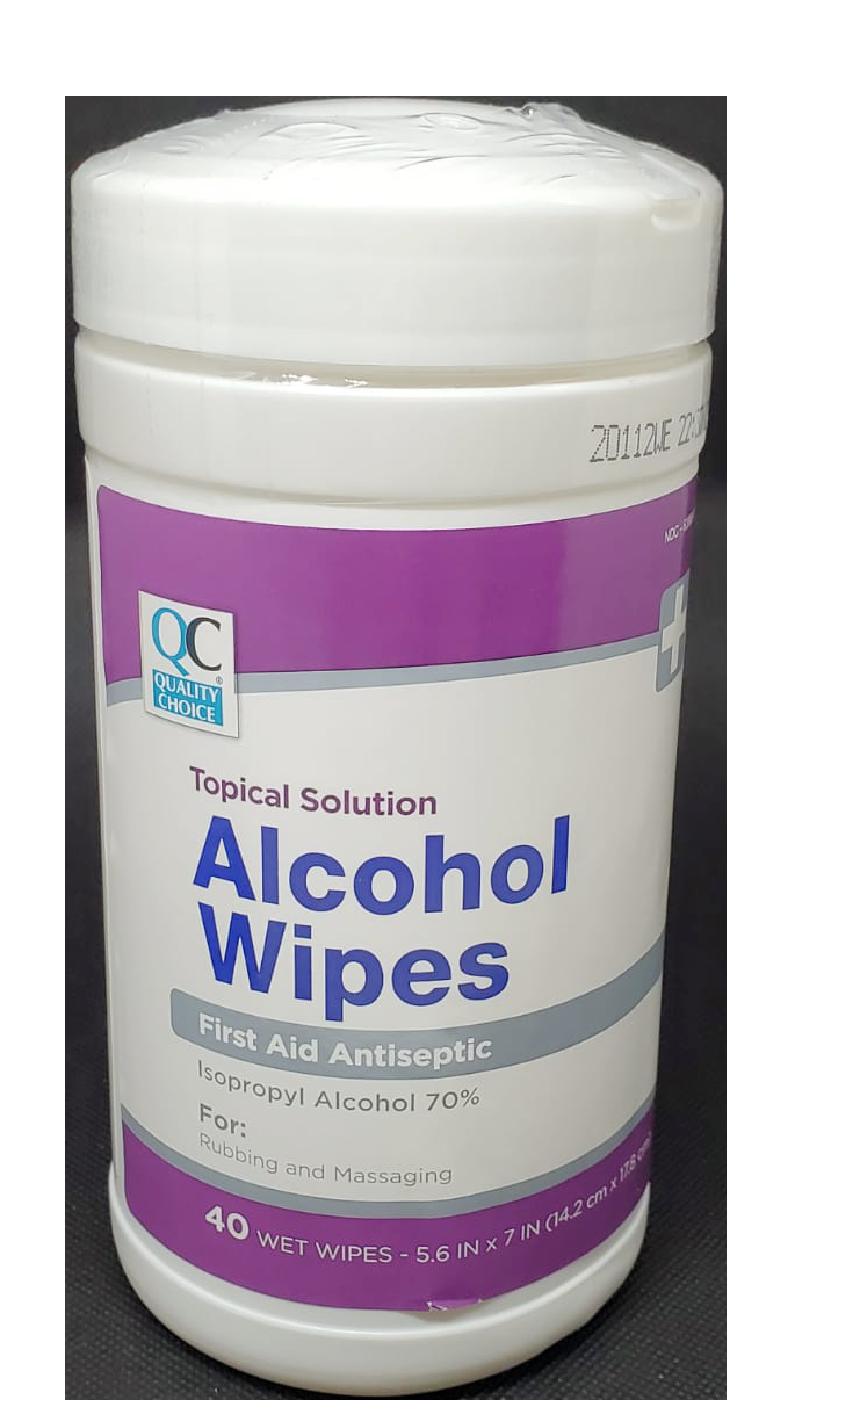 QC Alcohol Wipes